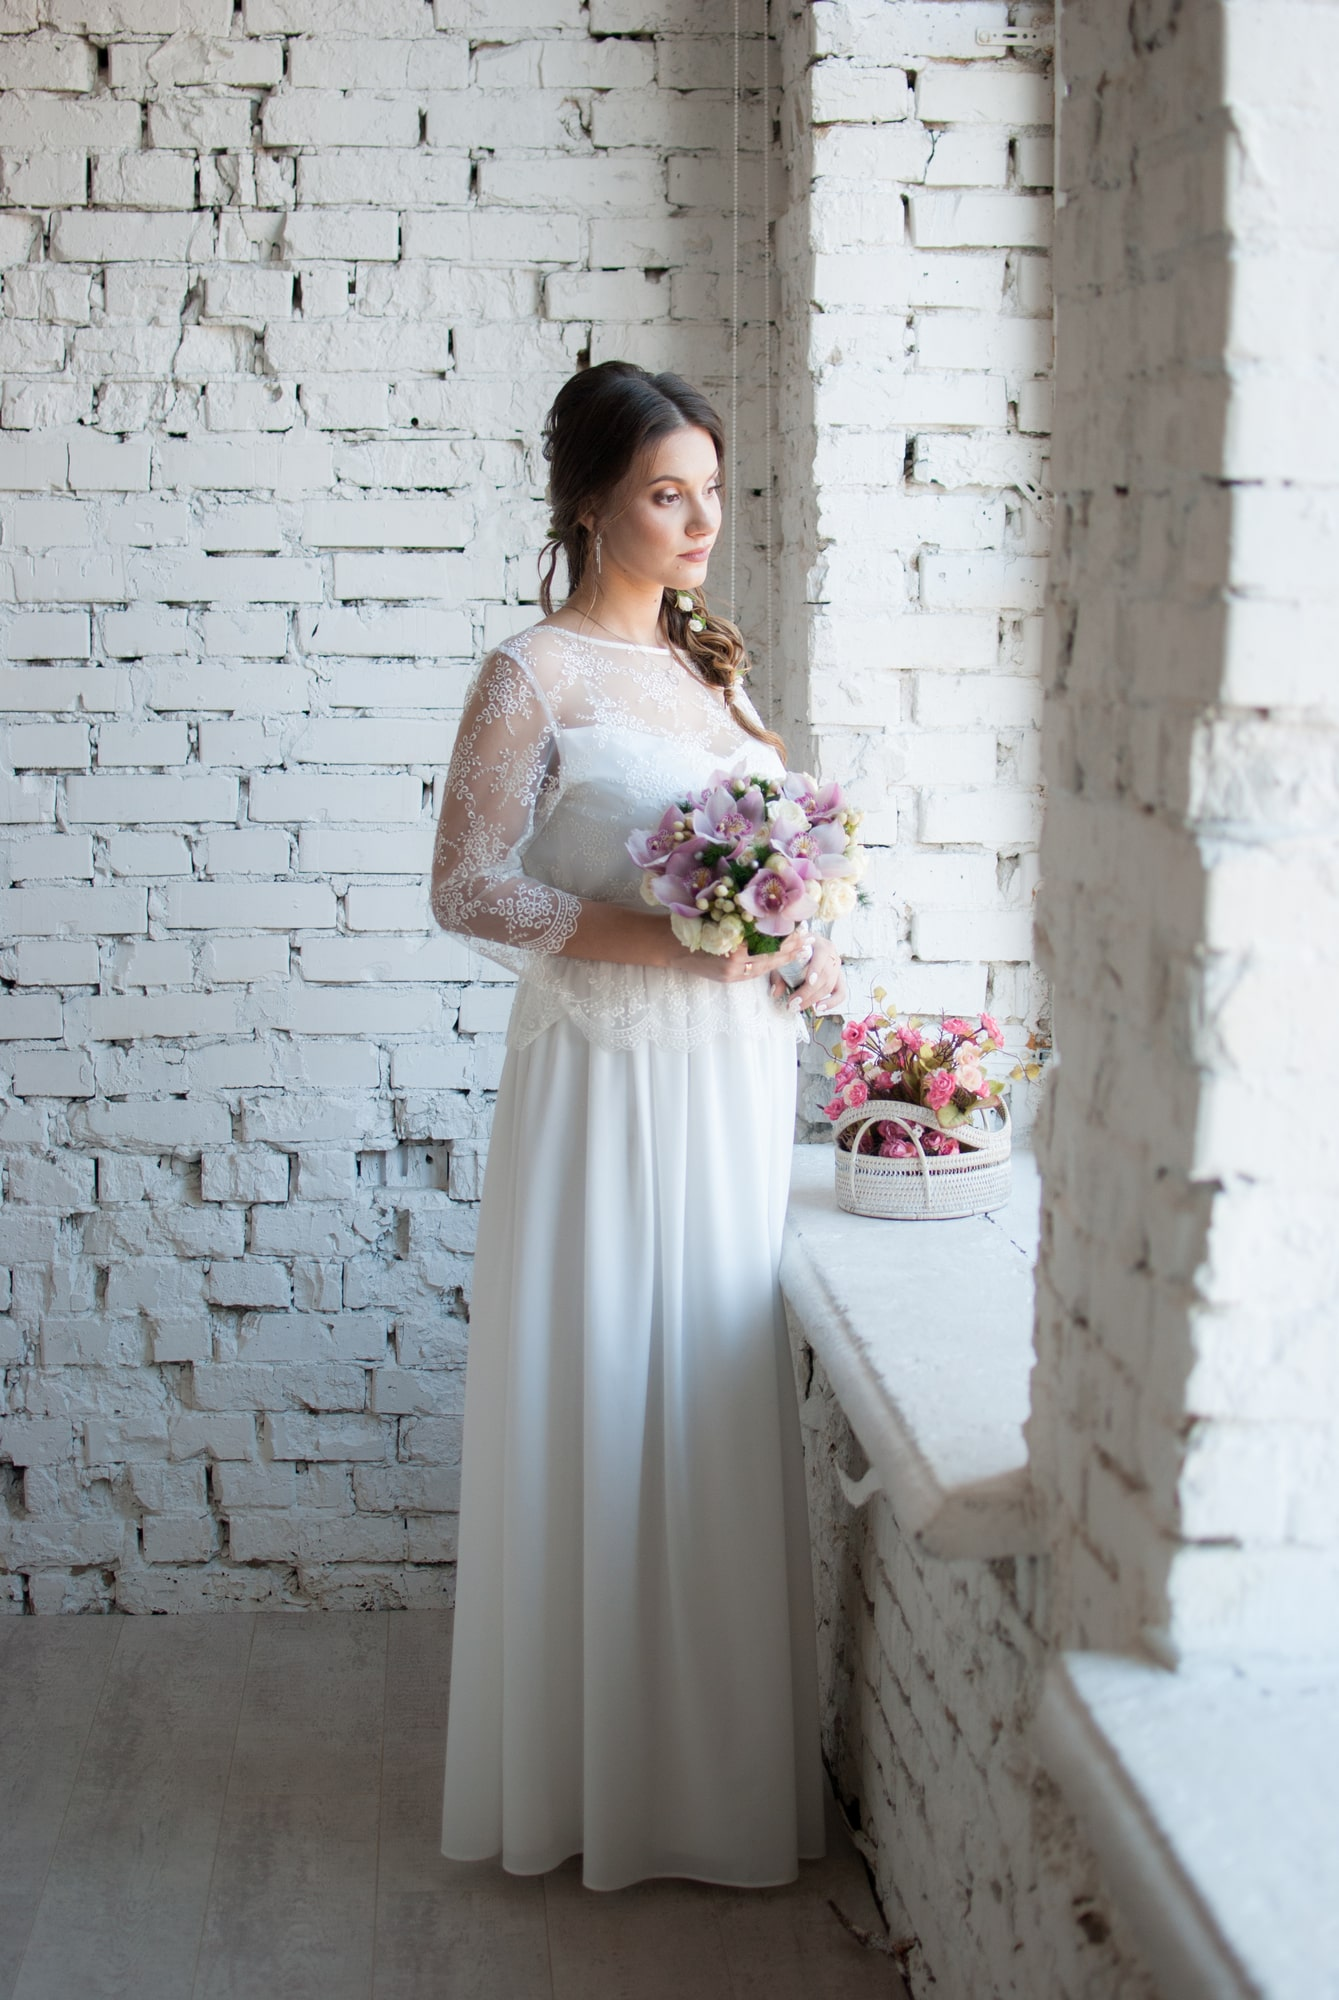 Молодая невеста возле окна